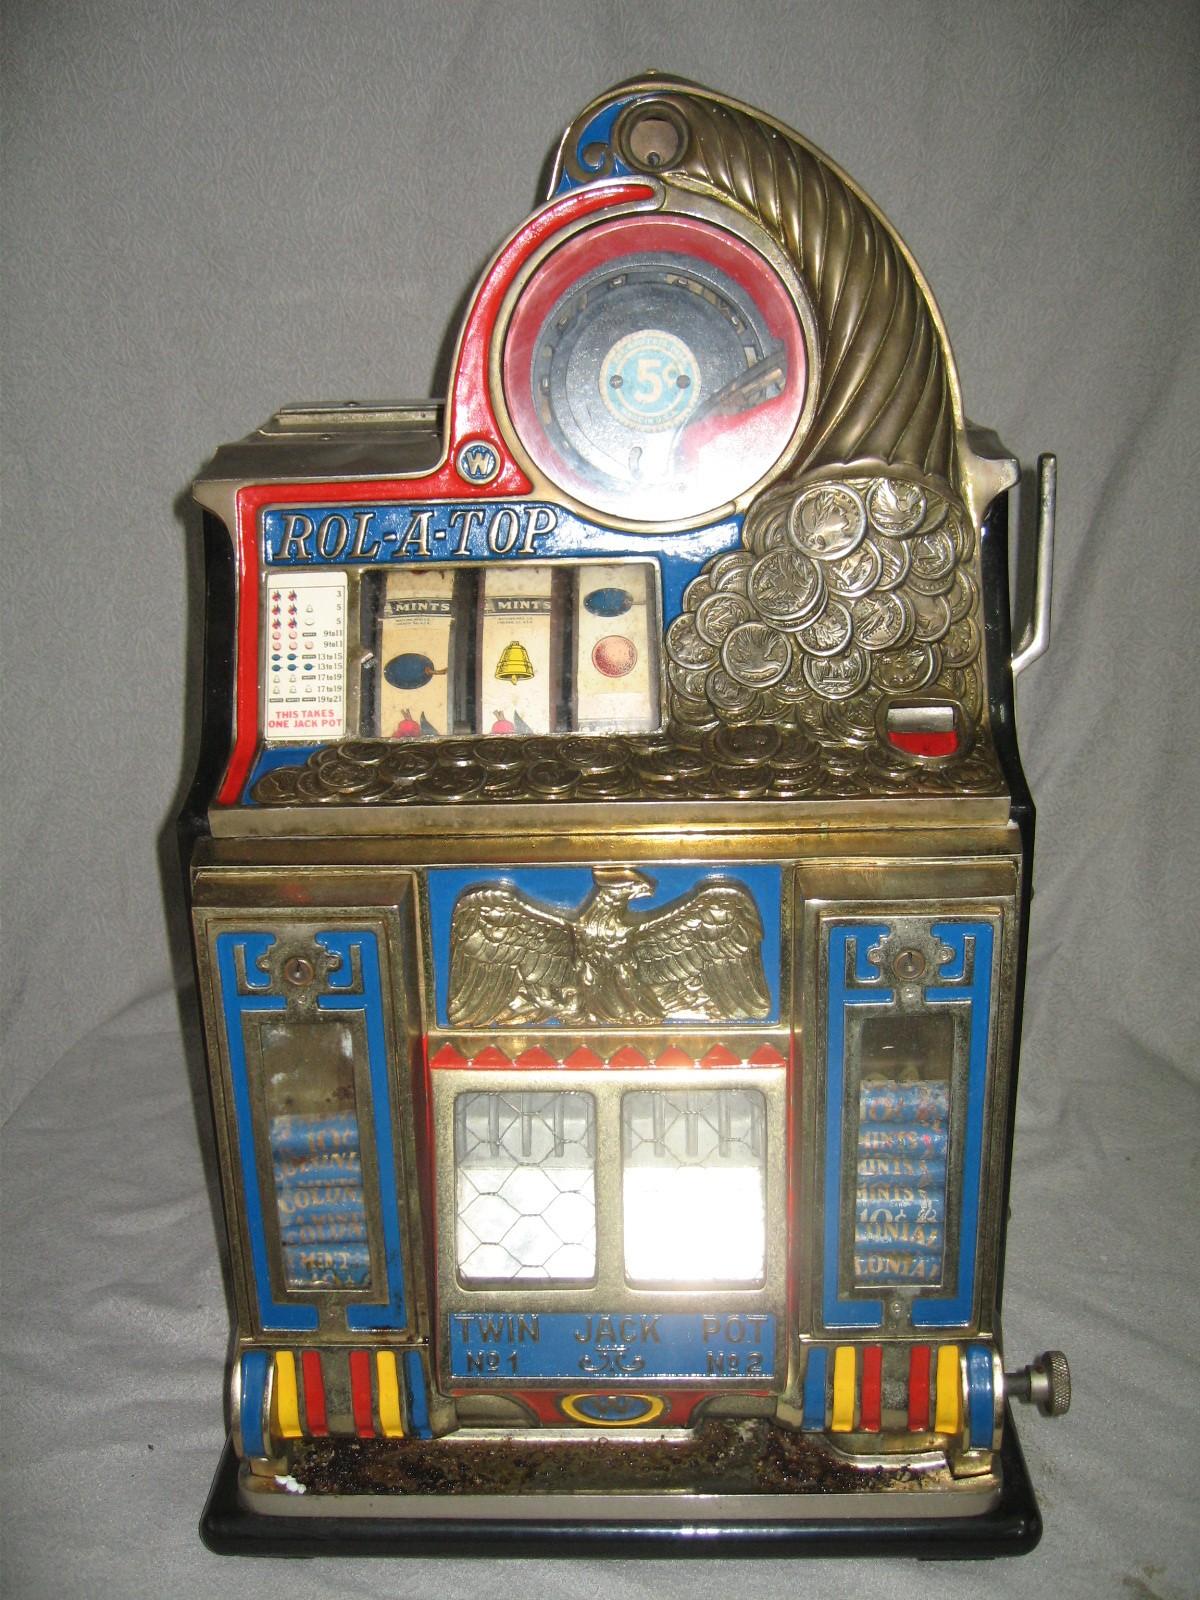 Rol a top slot machine download blackjack games